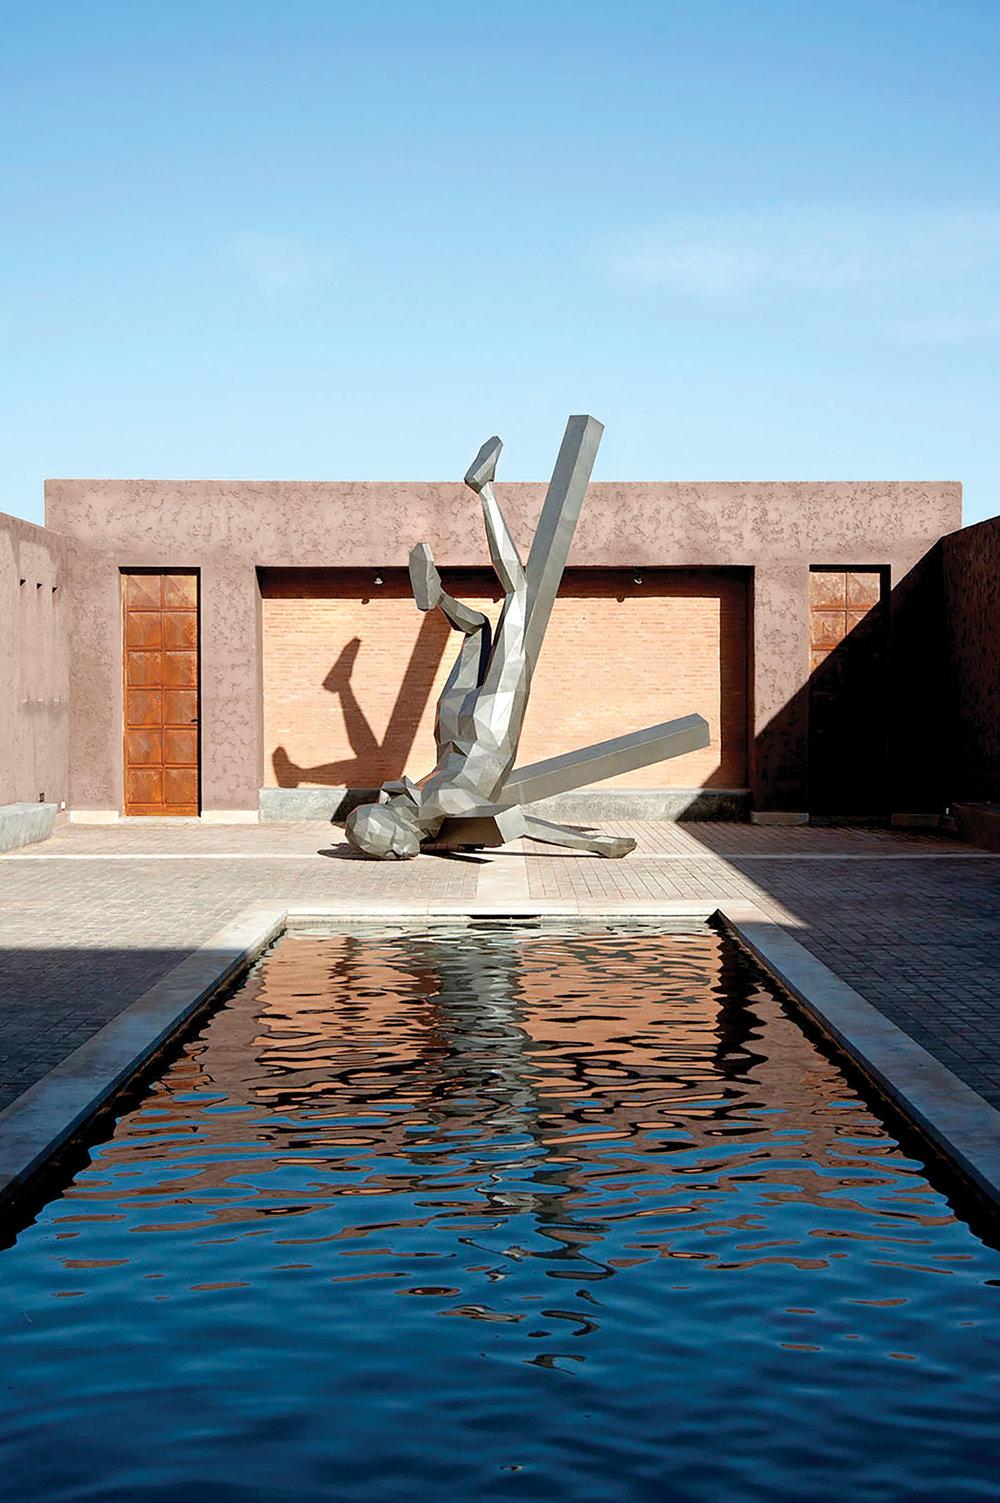 French artist Davis Mesguich's Fallen Selfie sculpture